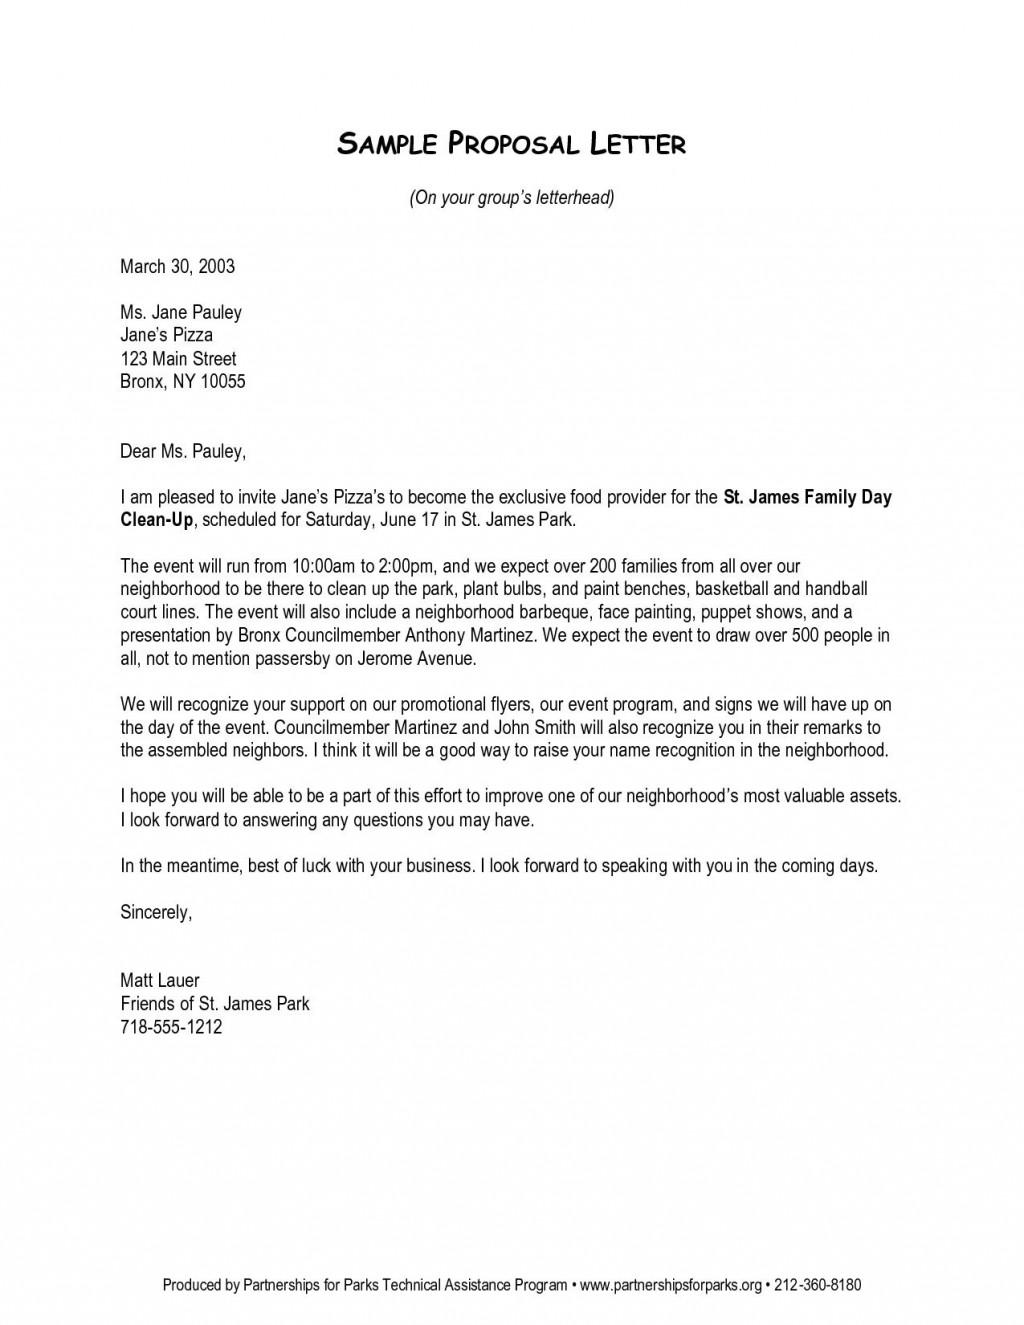 002 Wonderful Busines Proposal Letter Template High Resolution  Free DownloadLarge